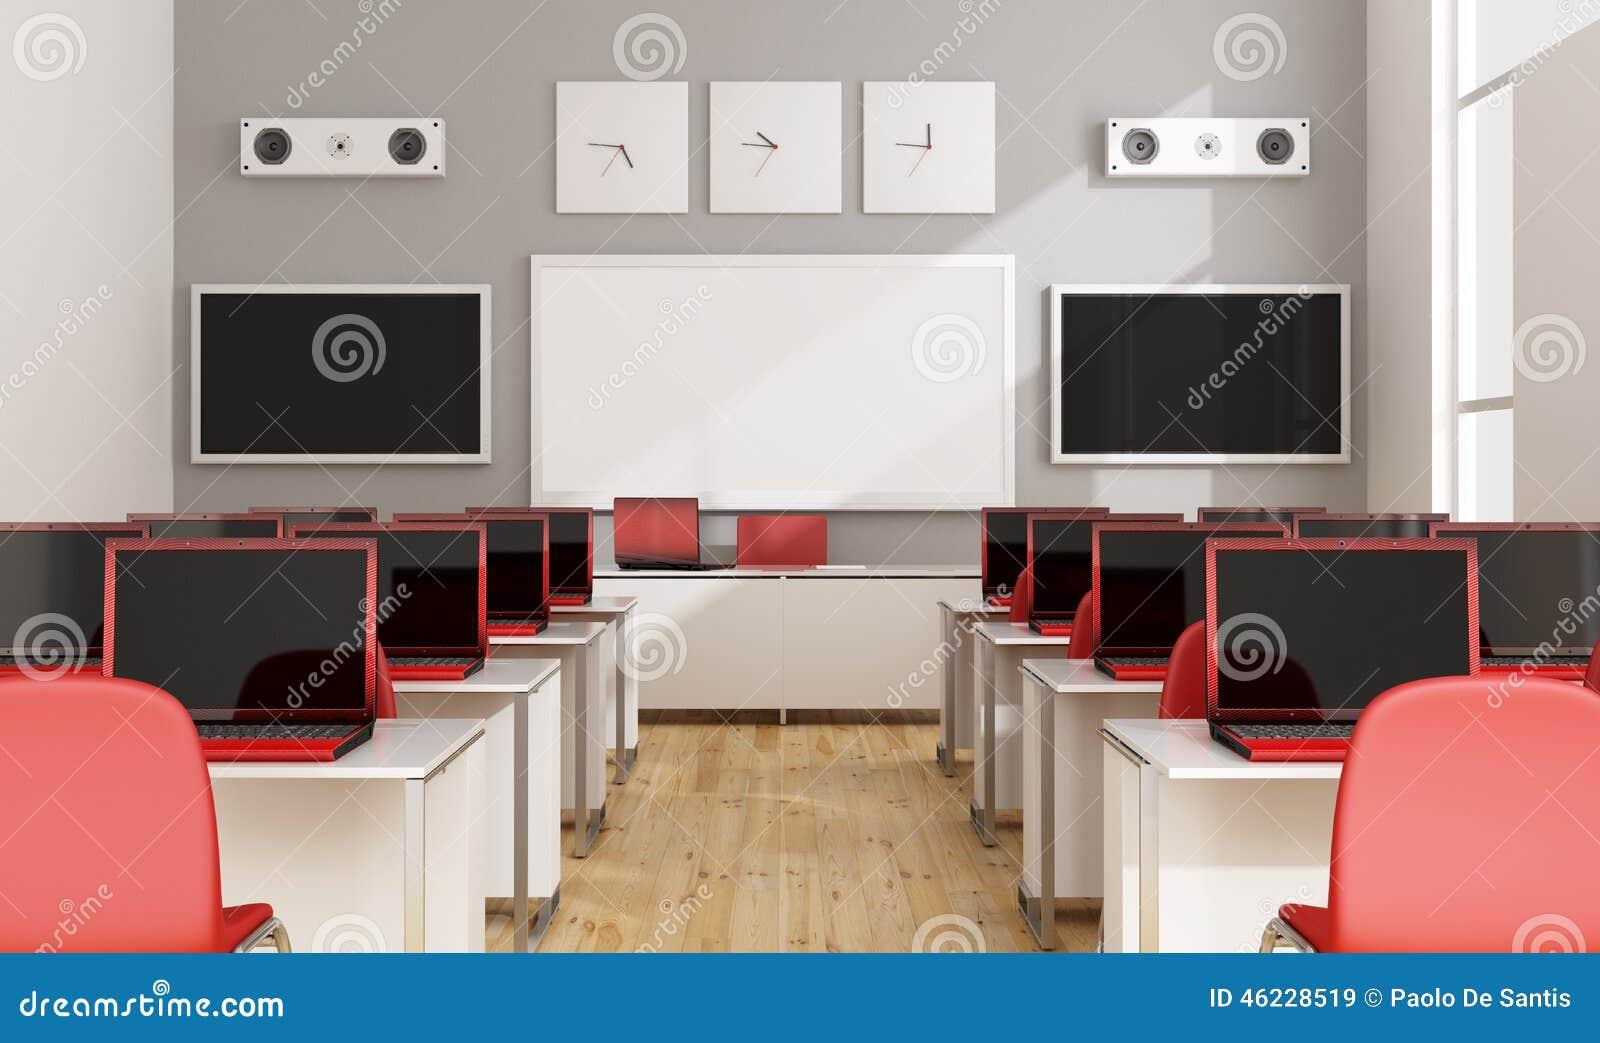 Multimedia Classroom Design : Modern multimedia classroom stock illustration image